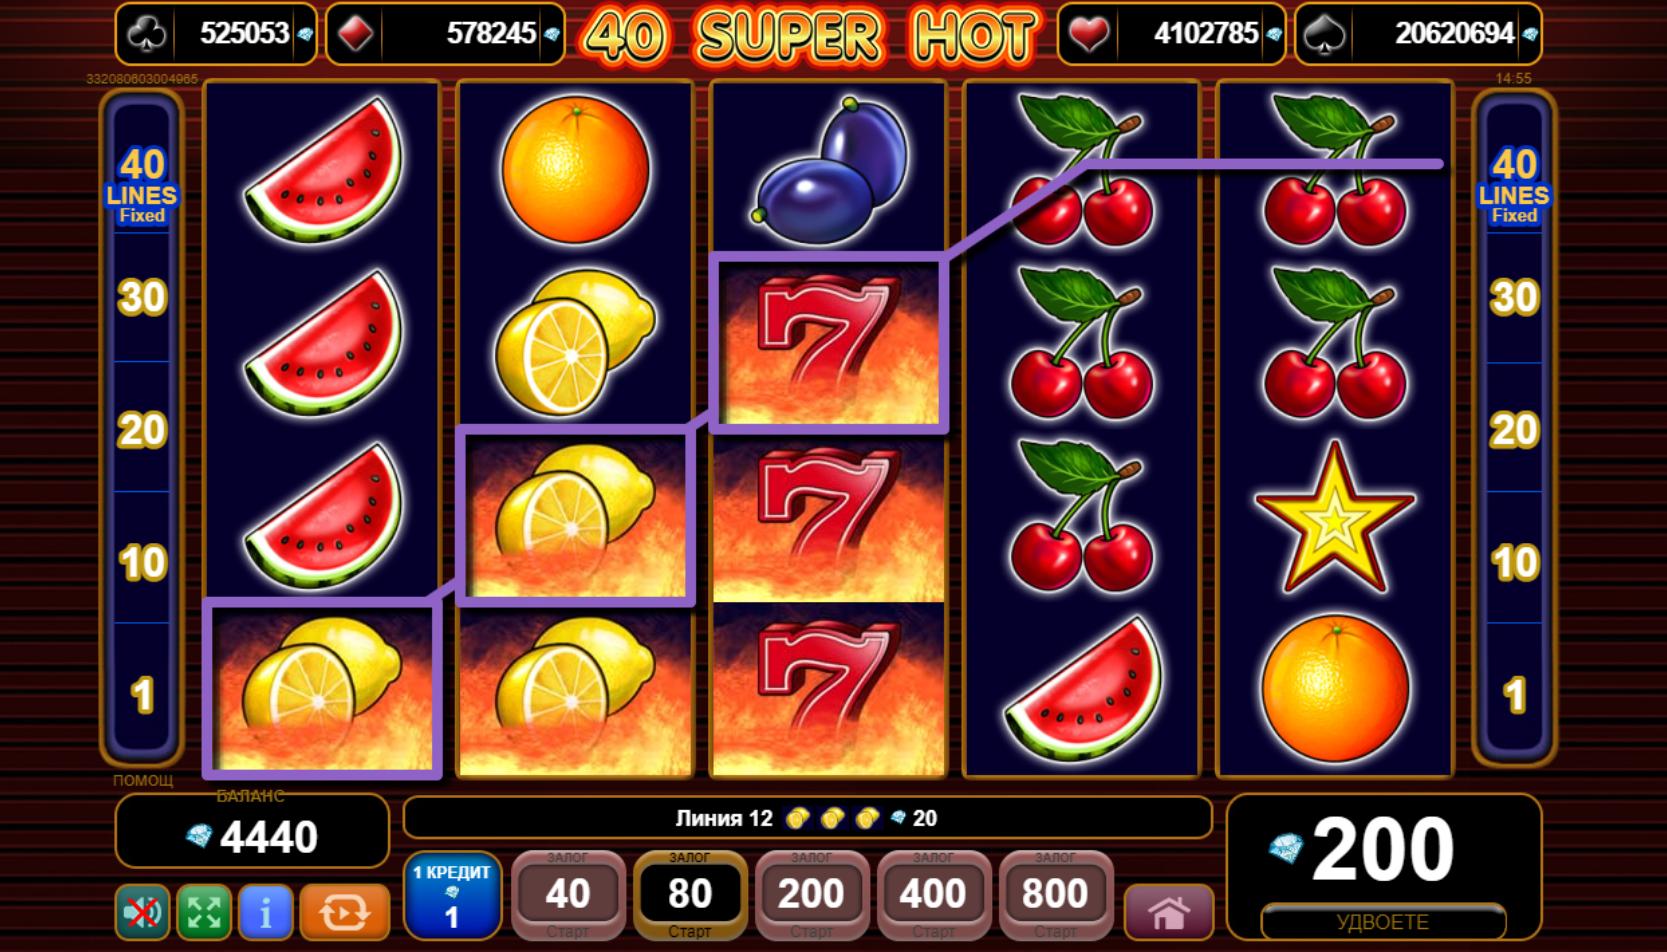 40 super hot demo slot-komarbet.com